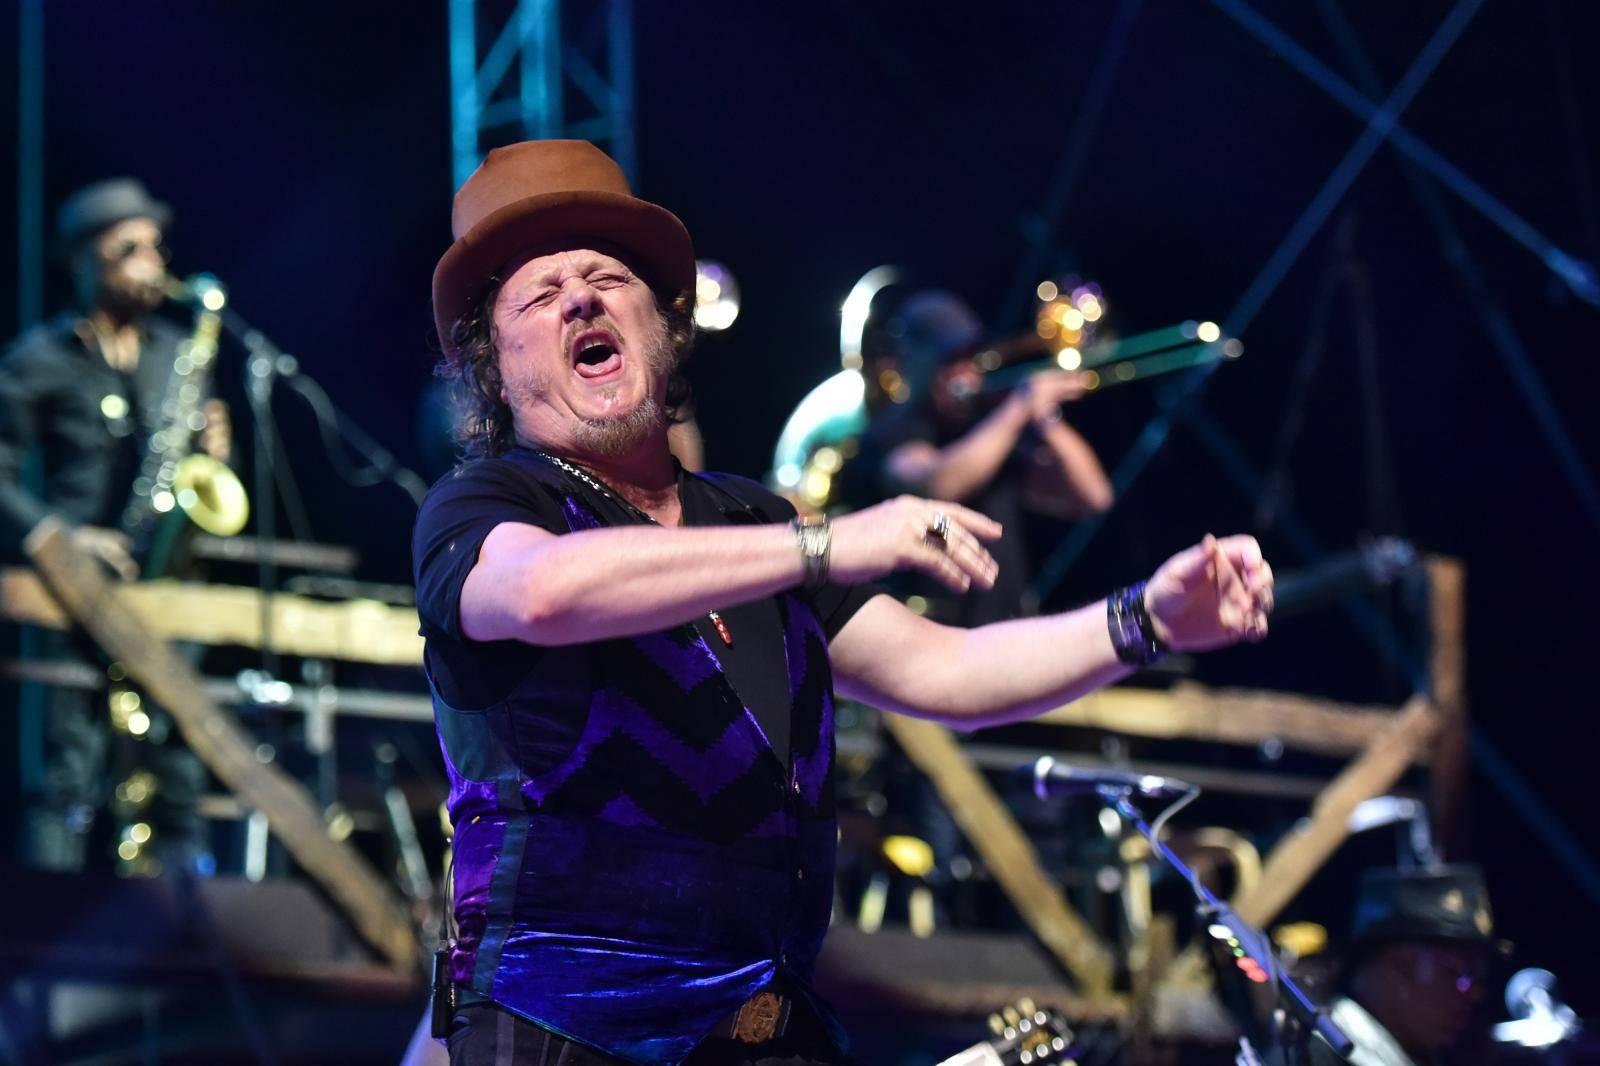 Pjevao s Claptonom i Bonom: Zucchero 2020. u Lisinskom...